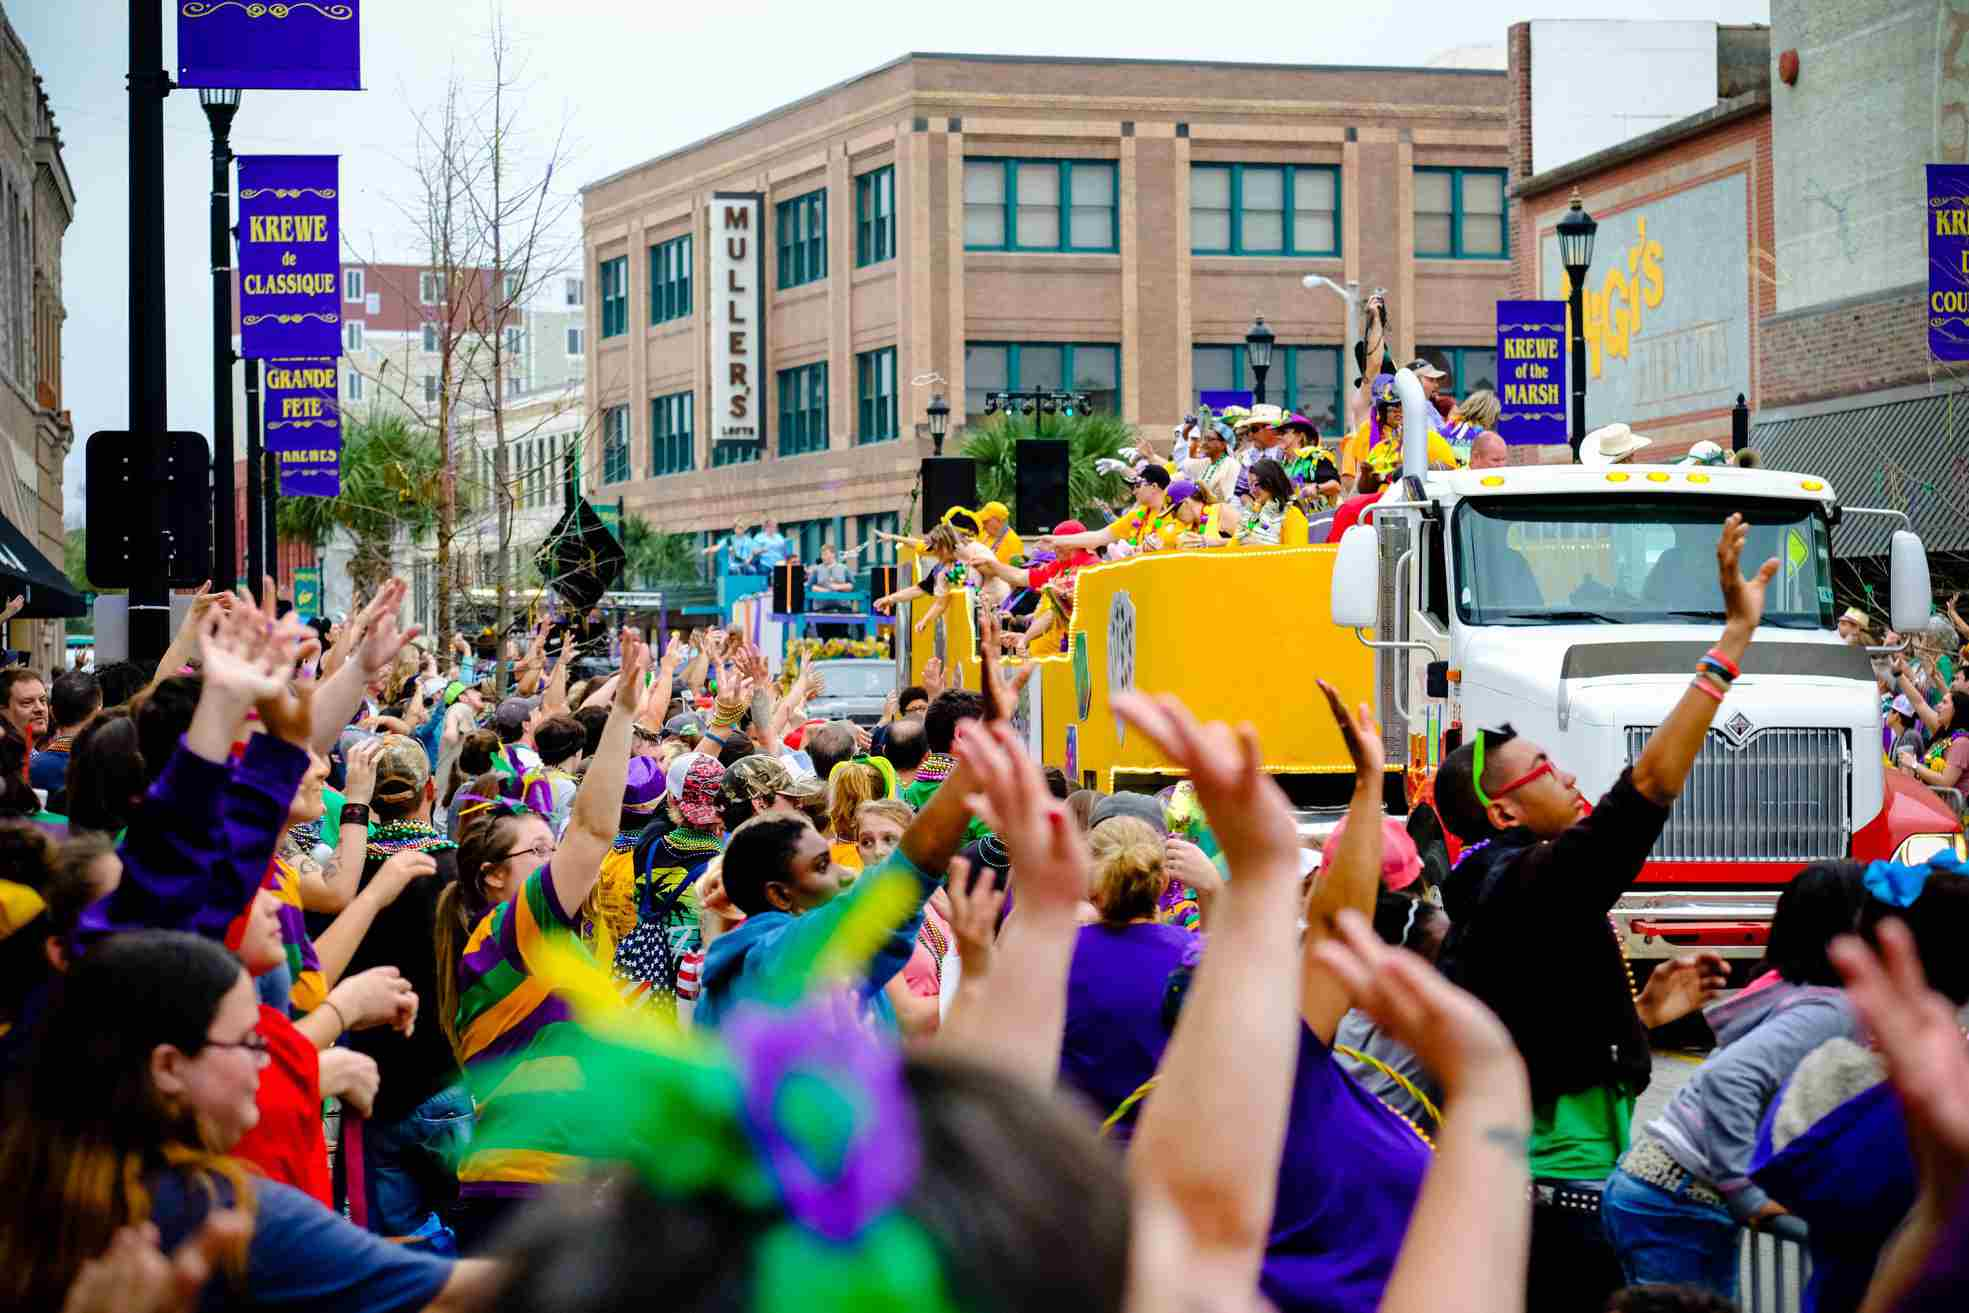 Lake Charles Mardi Gras parade